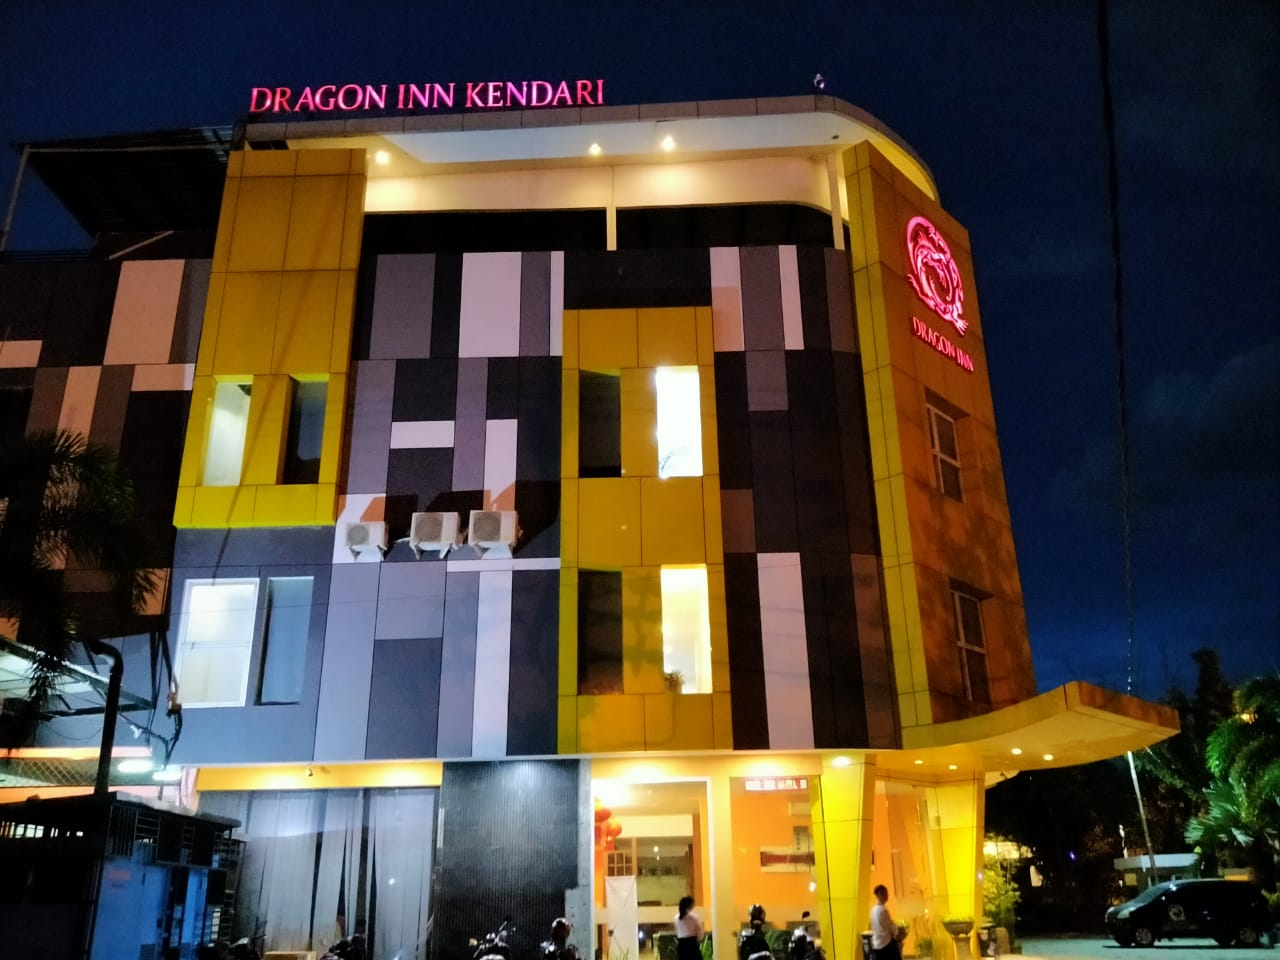 Hotel Dragon IIN Kendari Foto : MEDIAKENDARI.com/Taswin Tahang